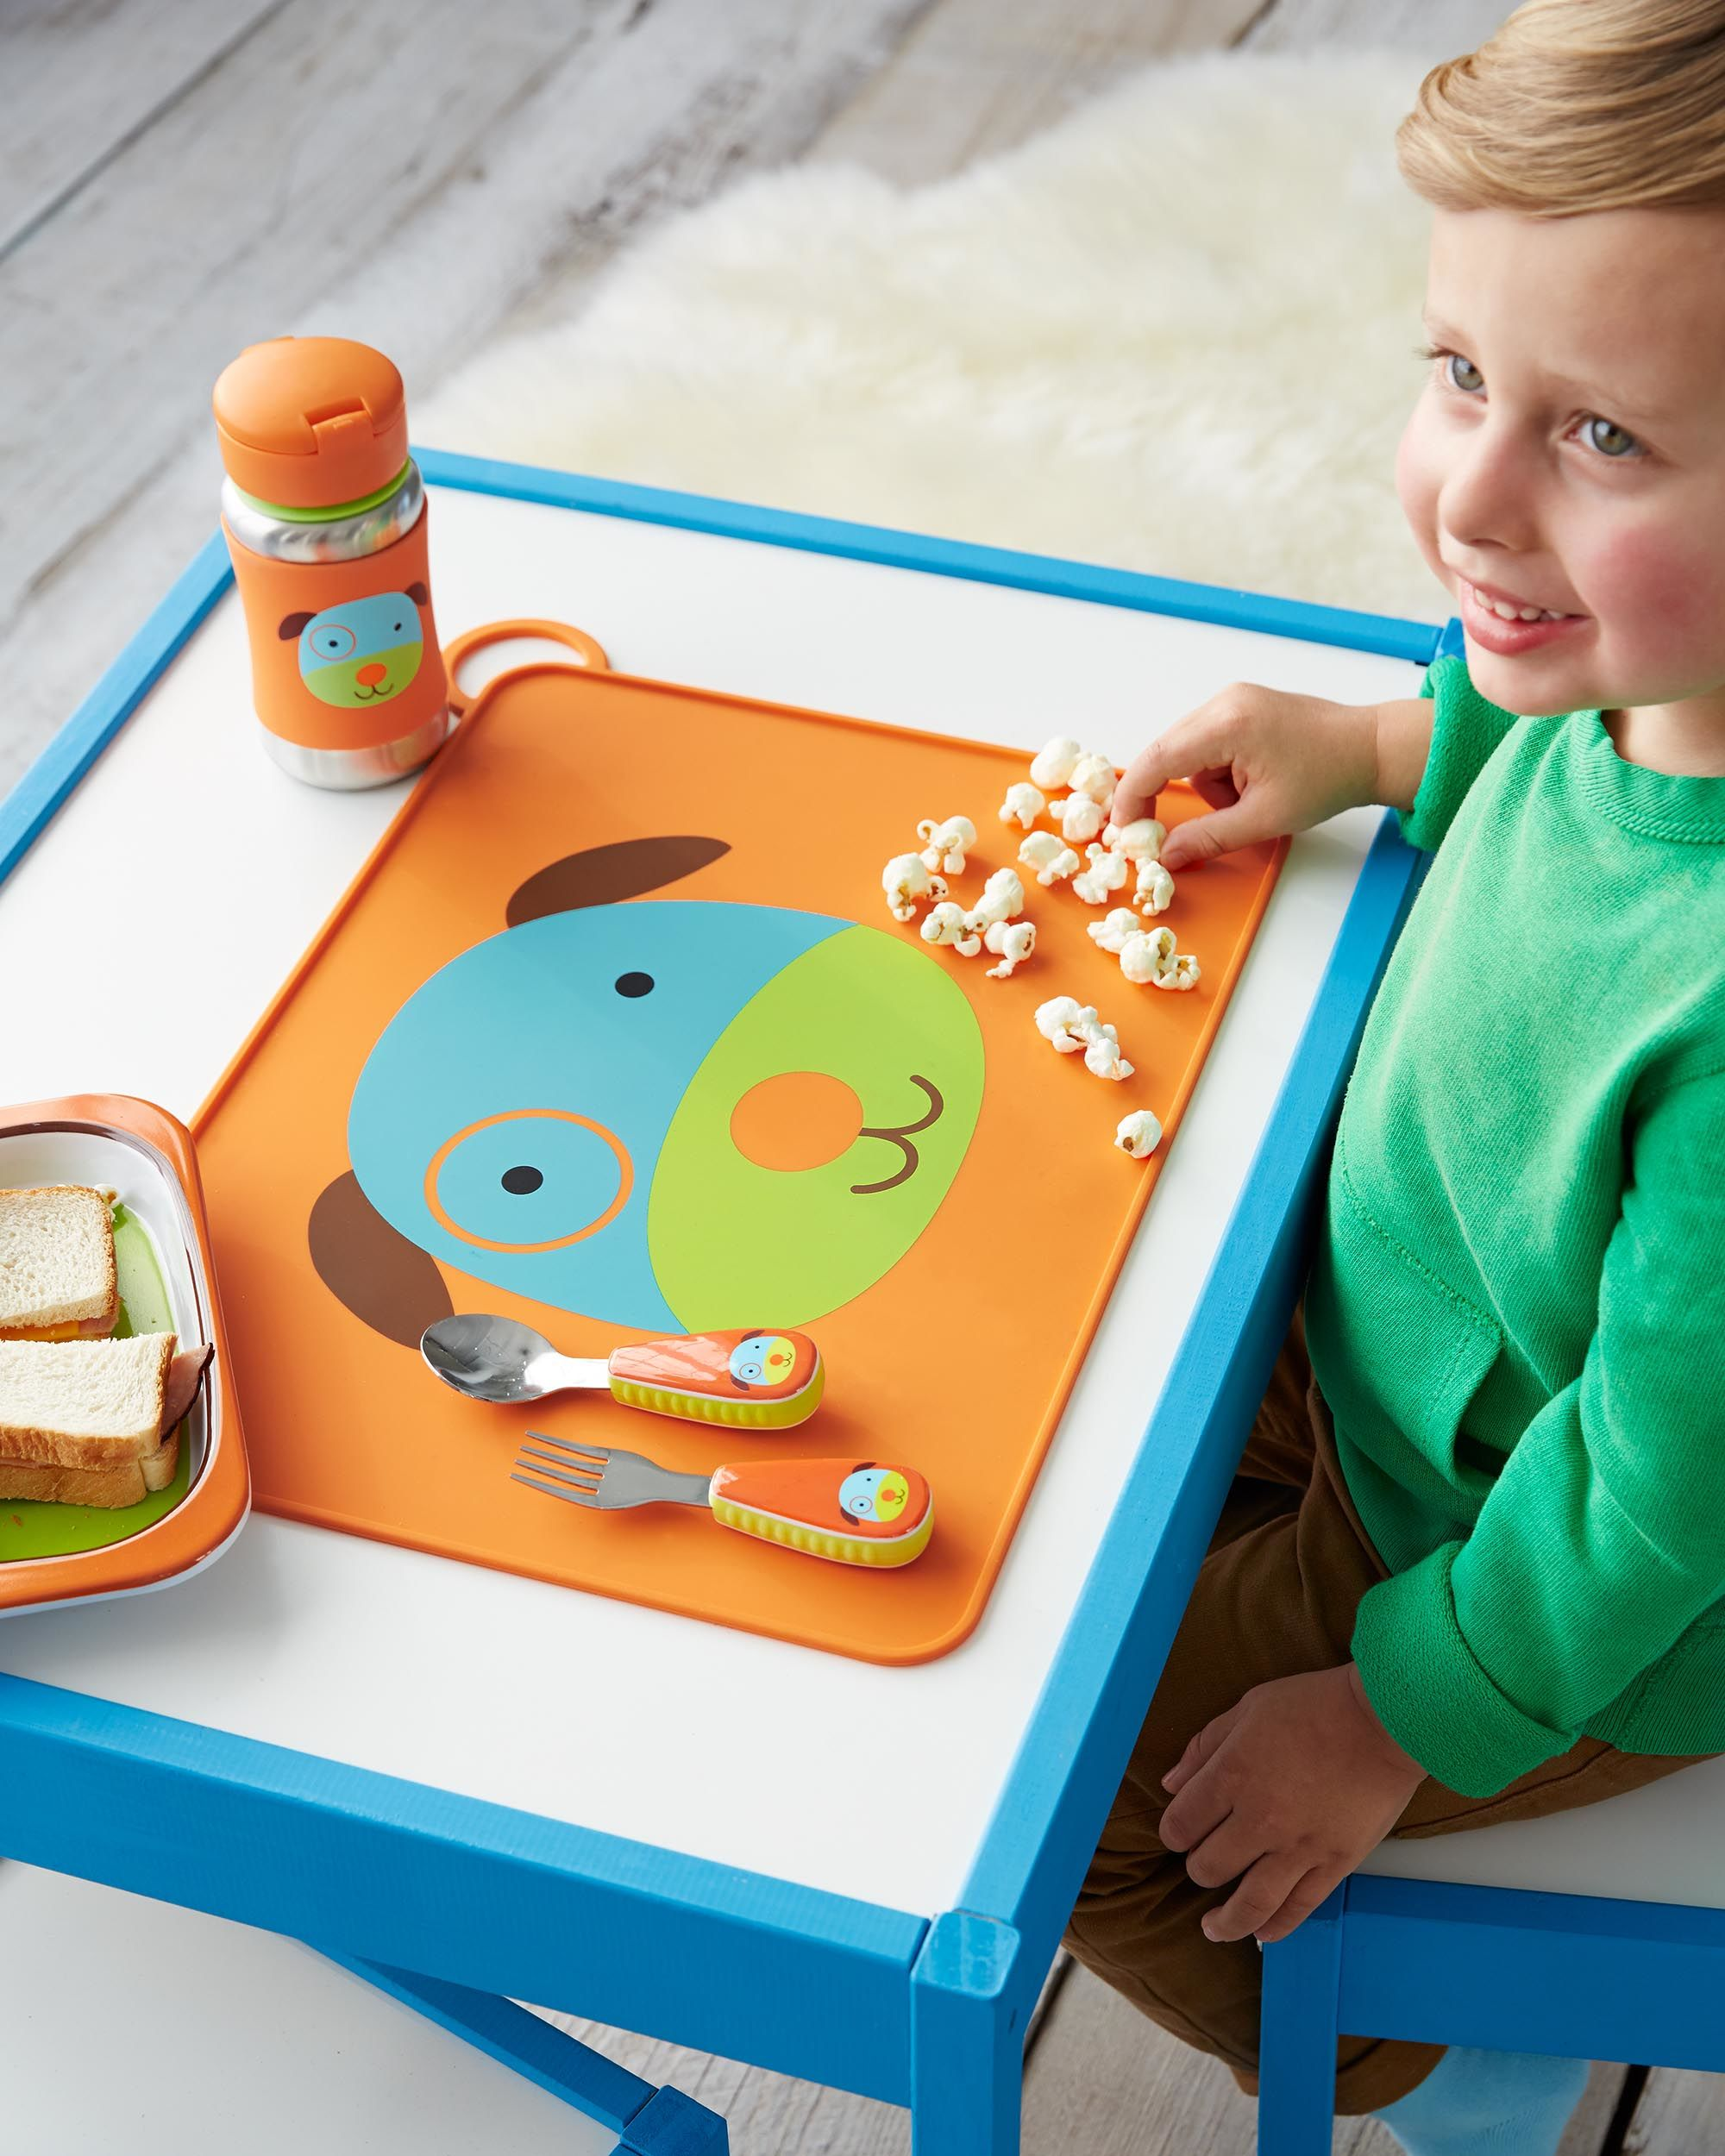 kids stainless steel feeding spoon and fork 儿童不锈钢吃饭餐具汤匙叉